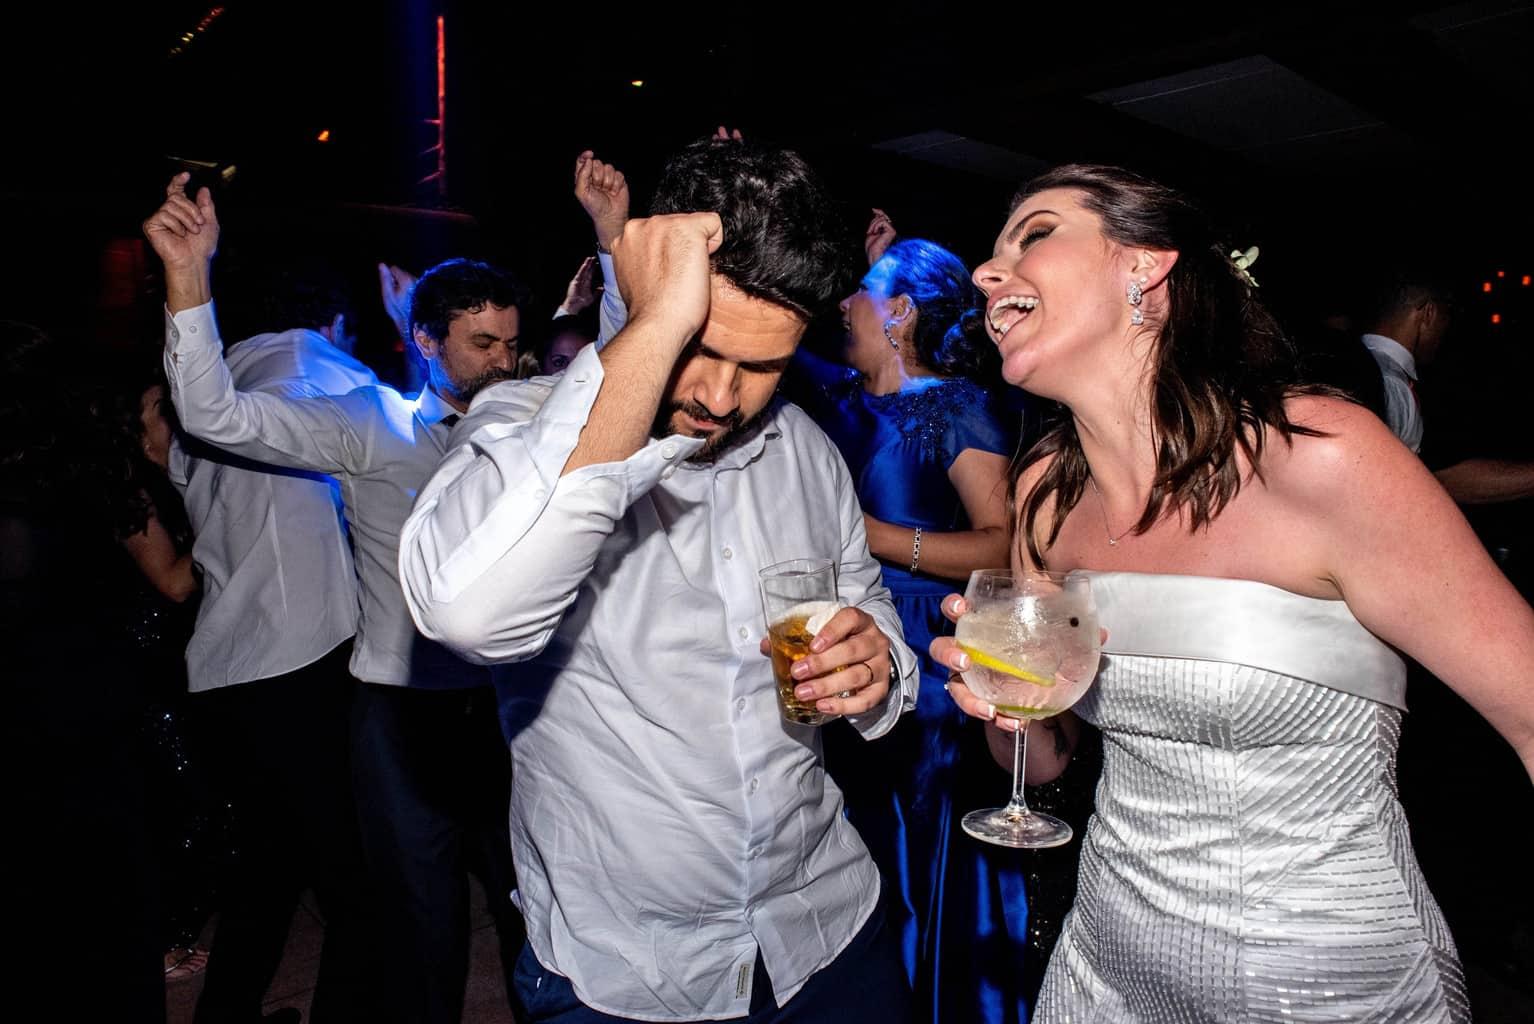 Bel-Benkler-eventos-Casamento-Ariane-e-Matheus-cerimonia-decoracao-contemporanea-fotografia-Rafael-Bigarelli-noivos-na-pista-Spazio-Giardini-52